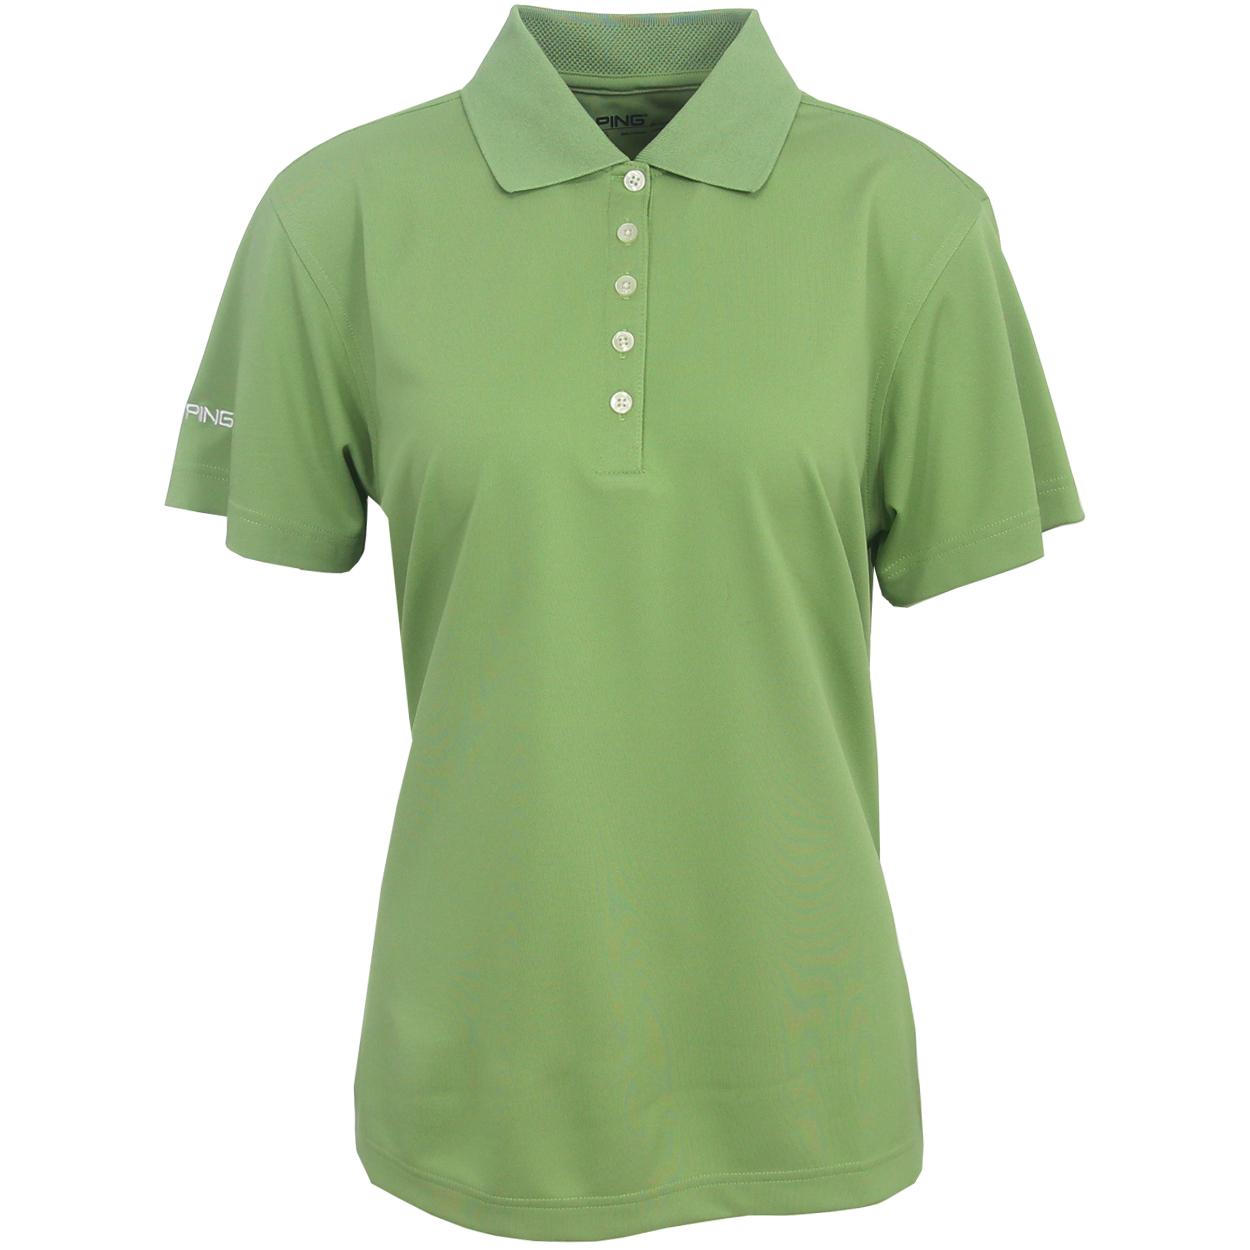 Ping women 39 s albatross performance polo golf shirt brand new for All polo shirt brands